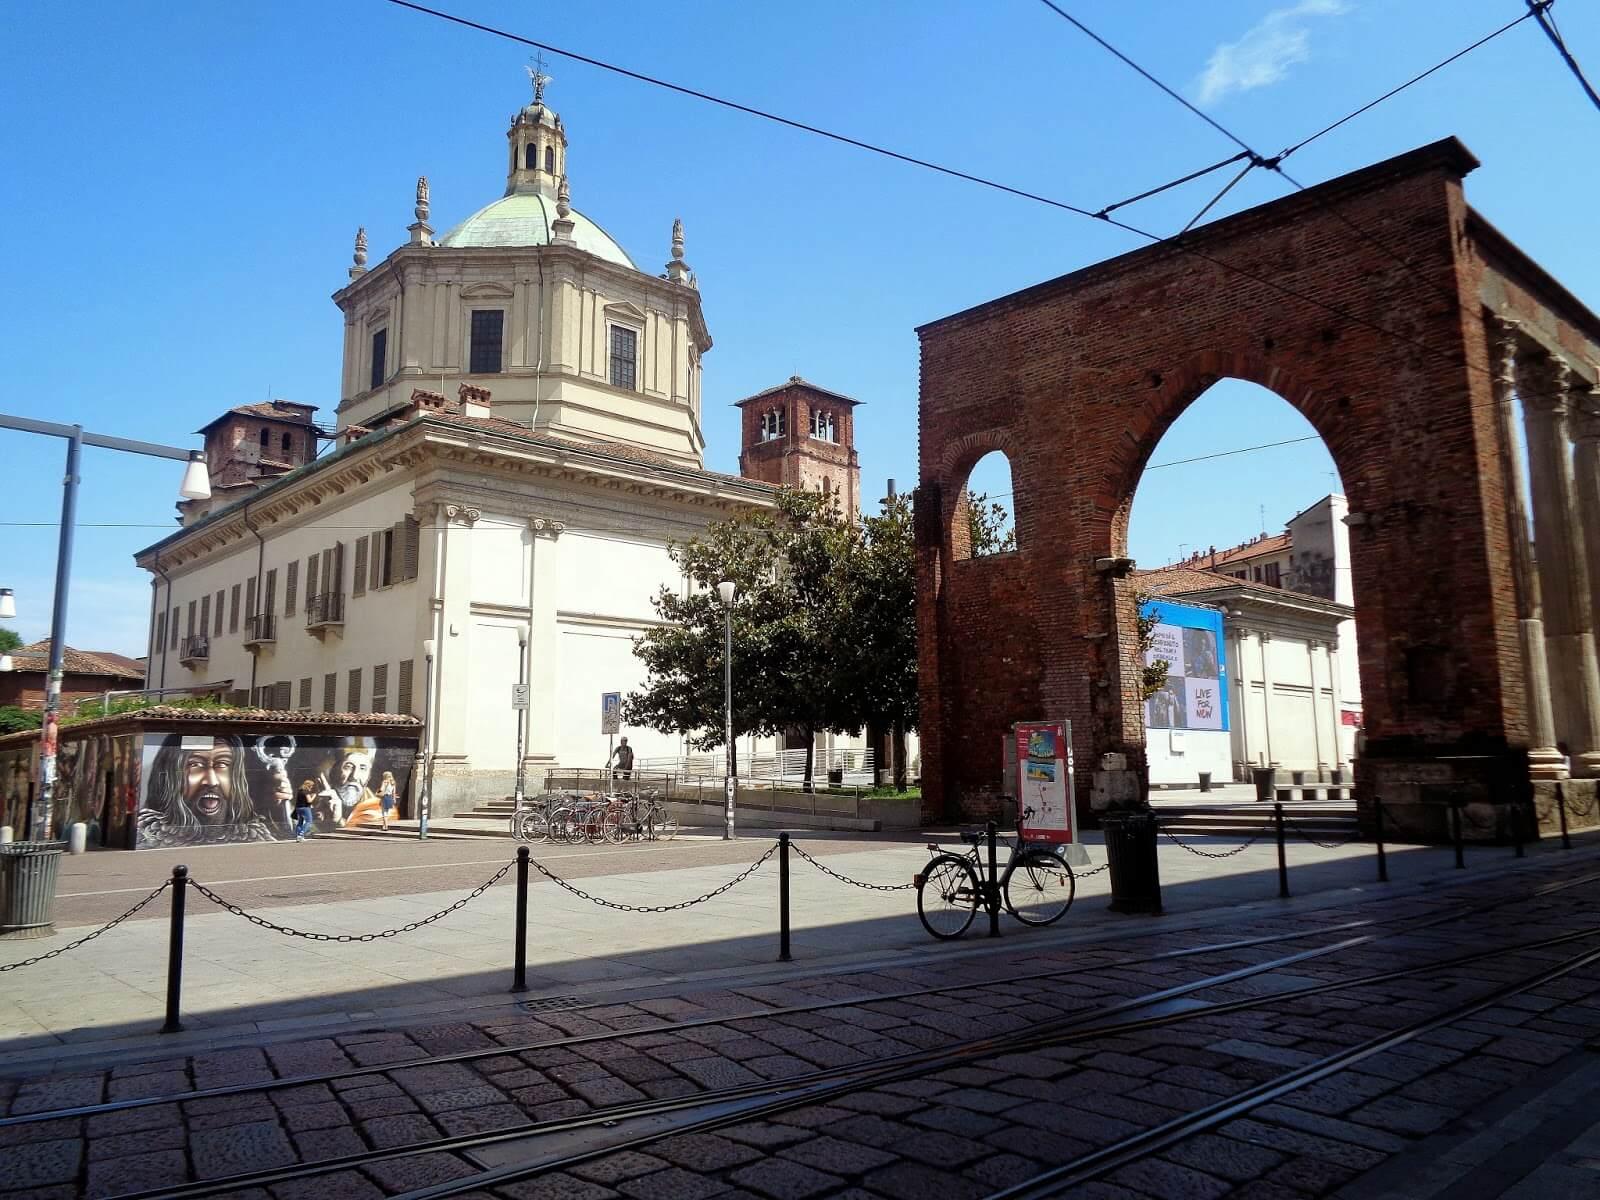 Ворота рядом с миланским храмом Базилика Сан - Лоренцо - Маджоре